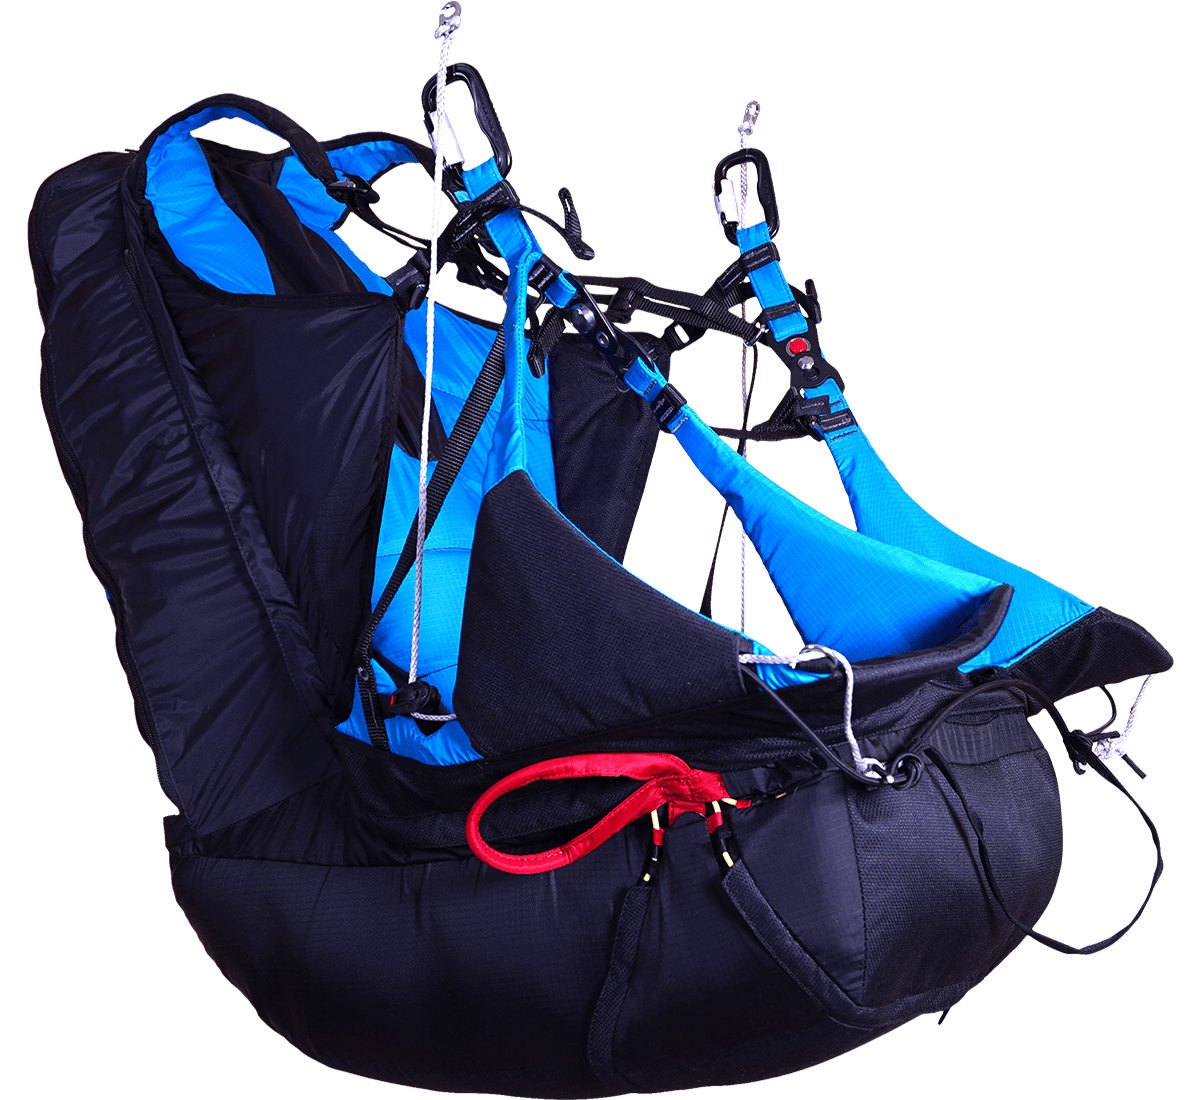 Paragliding / Soaring